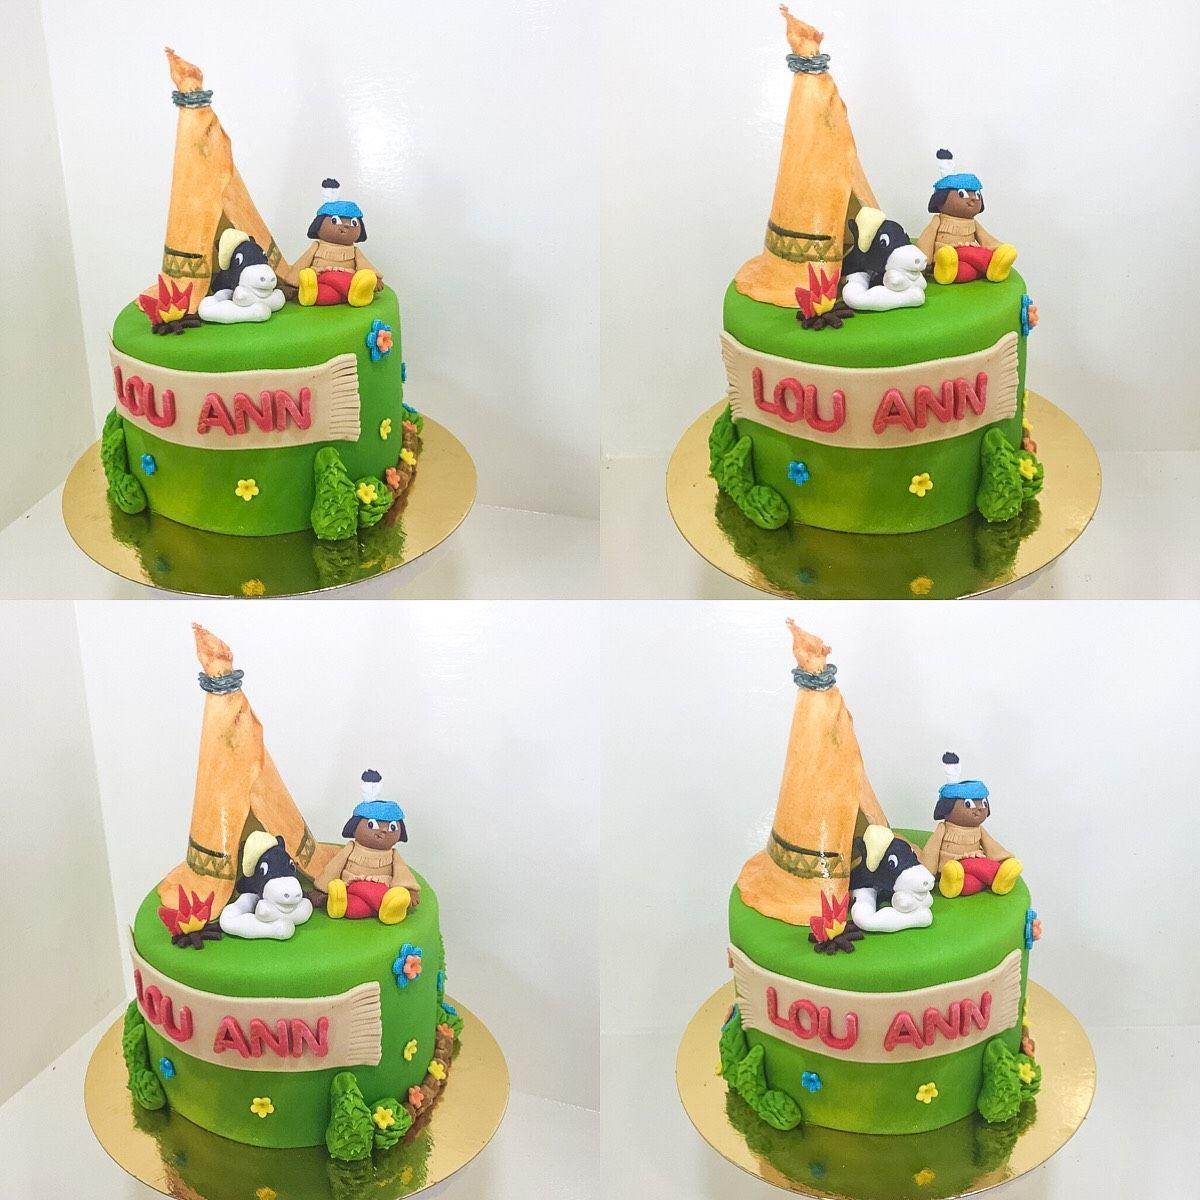 Yakari Cake Design Cake Design Cake Indian Cake Und Design